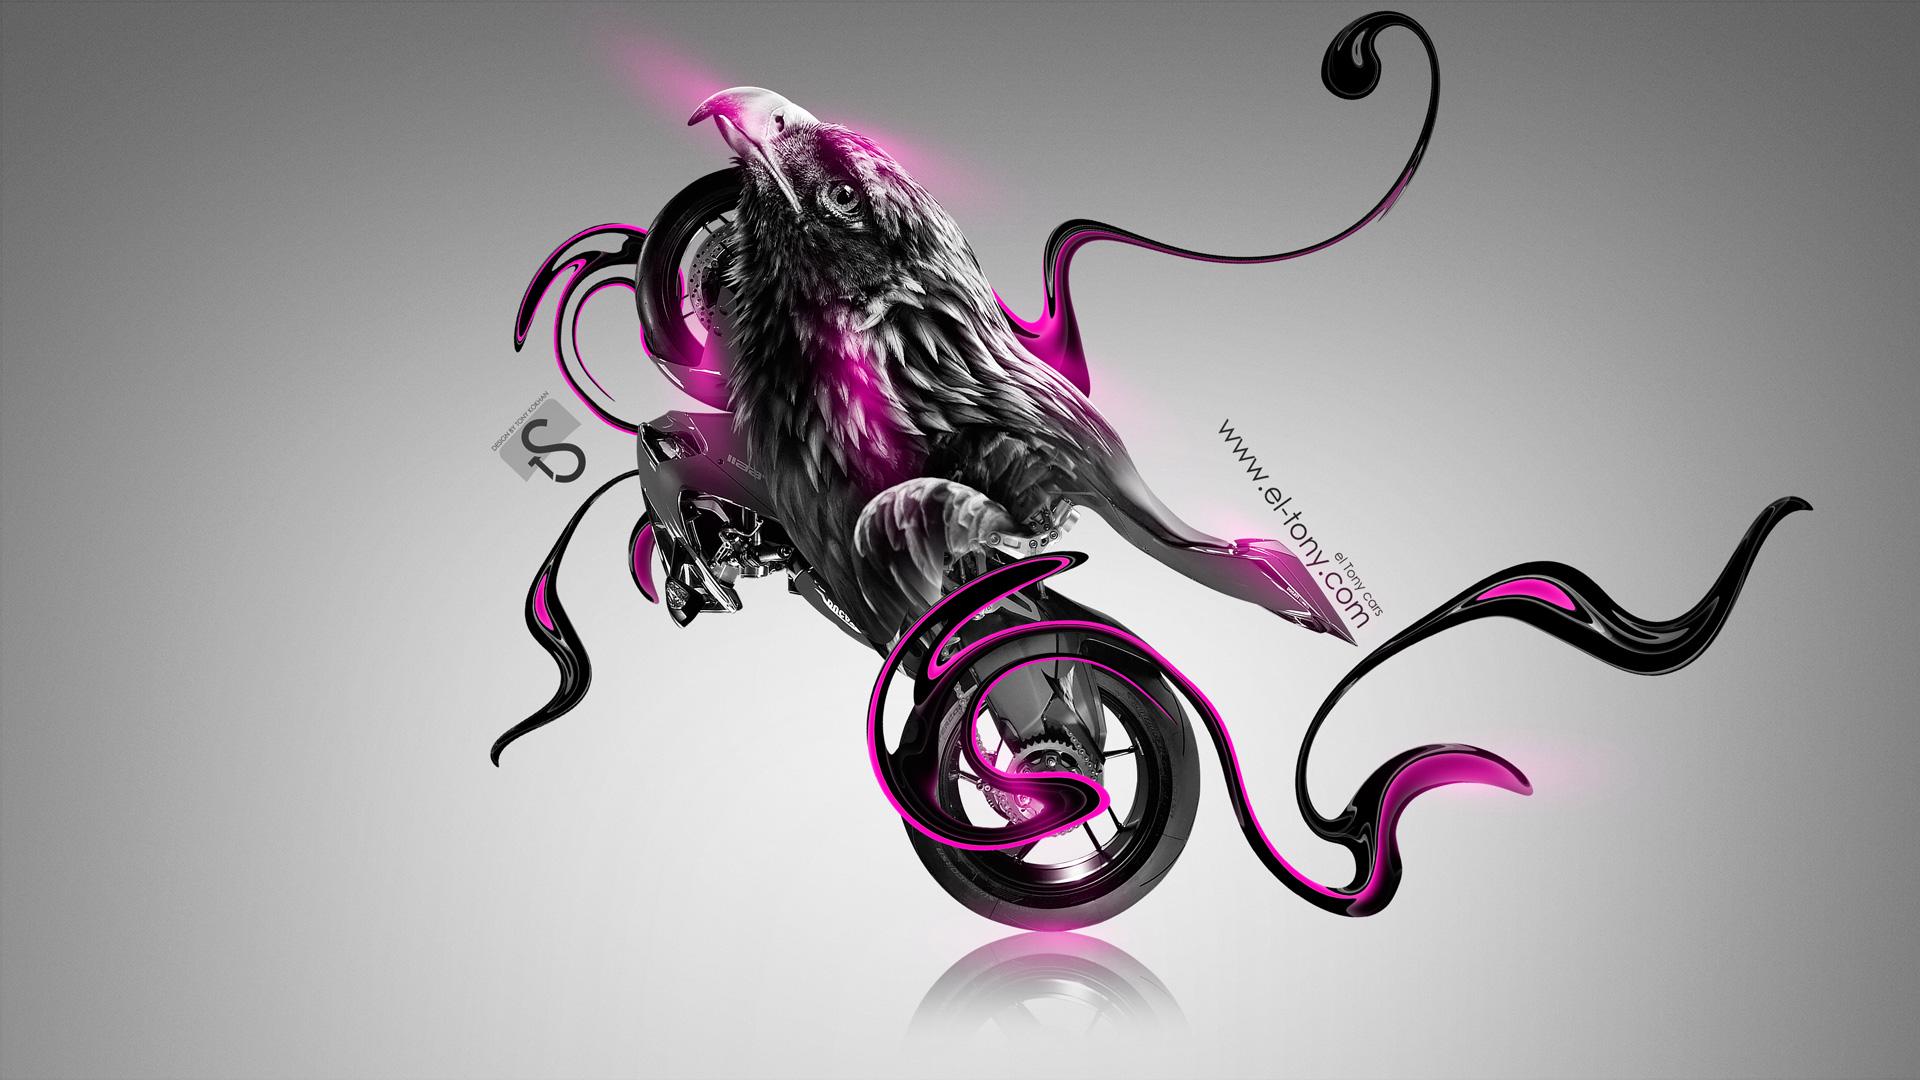 Moto Ducati 1199 Fantasy Bird Bike 2014 Pink Neon Design By Tony ...